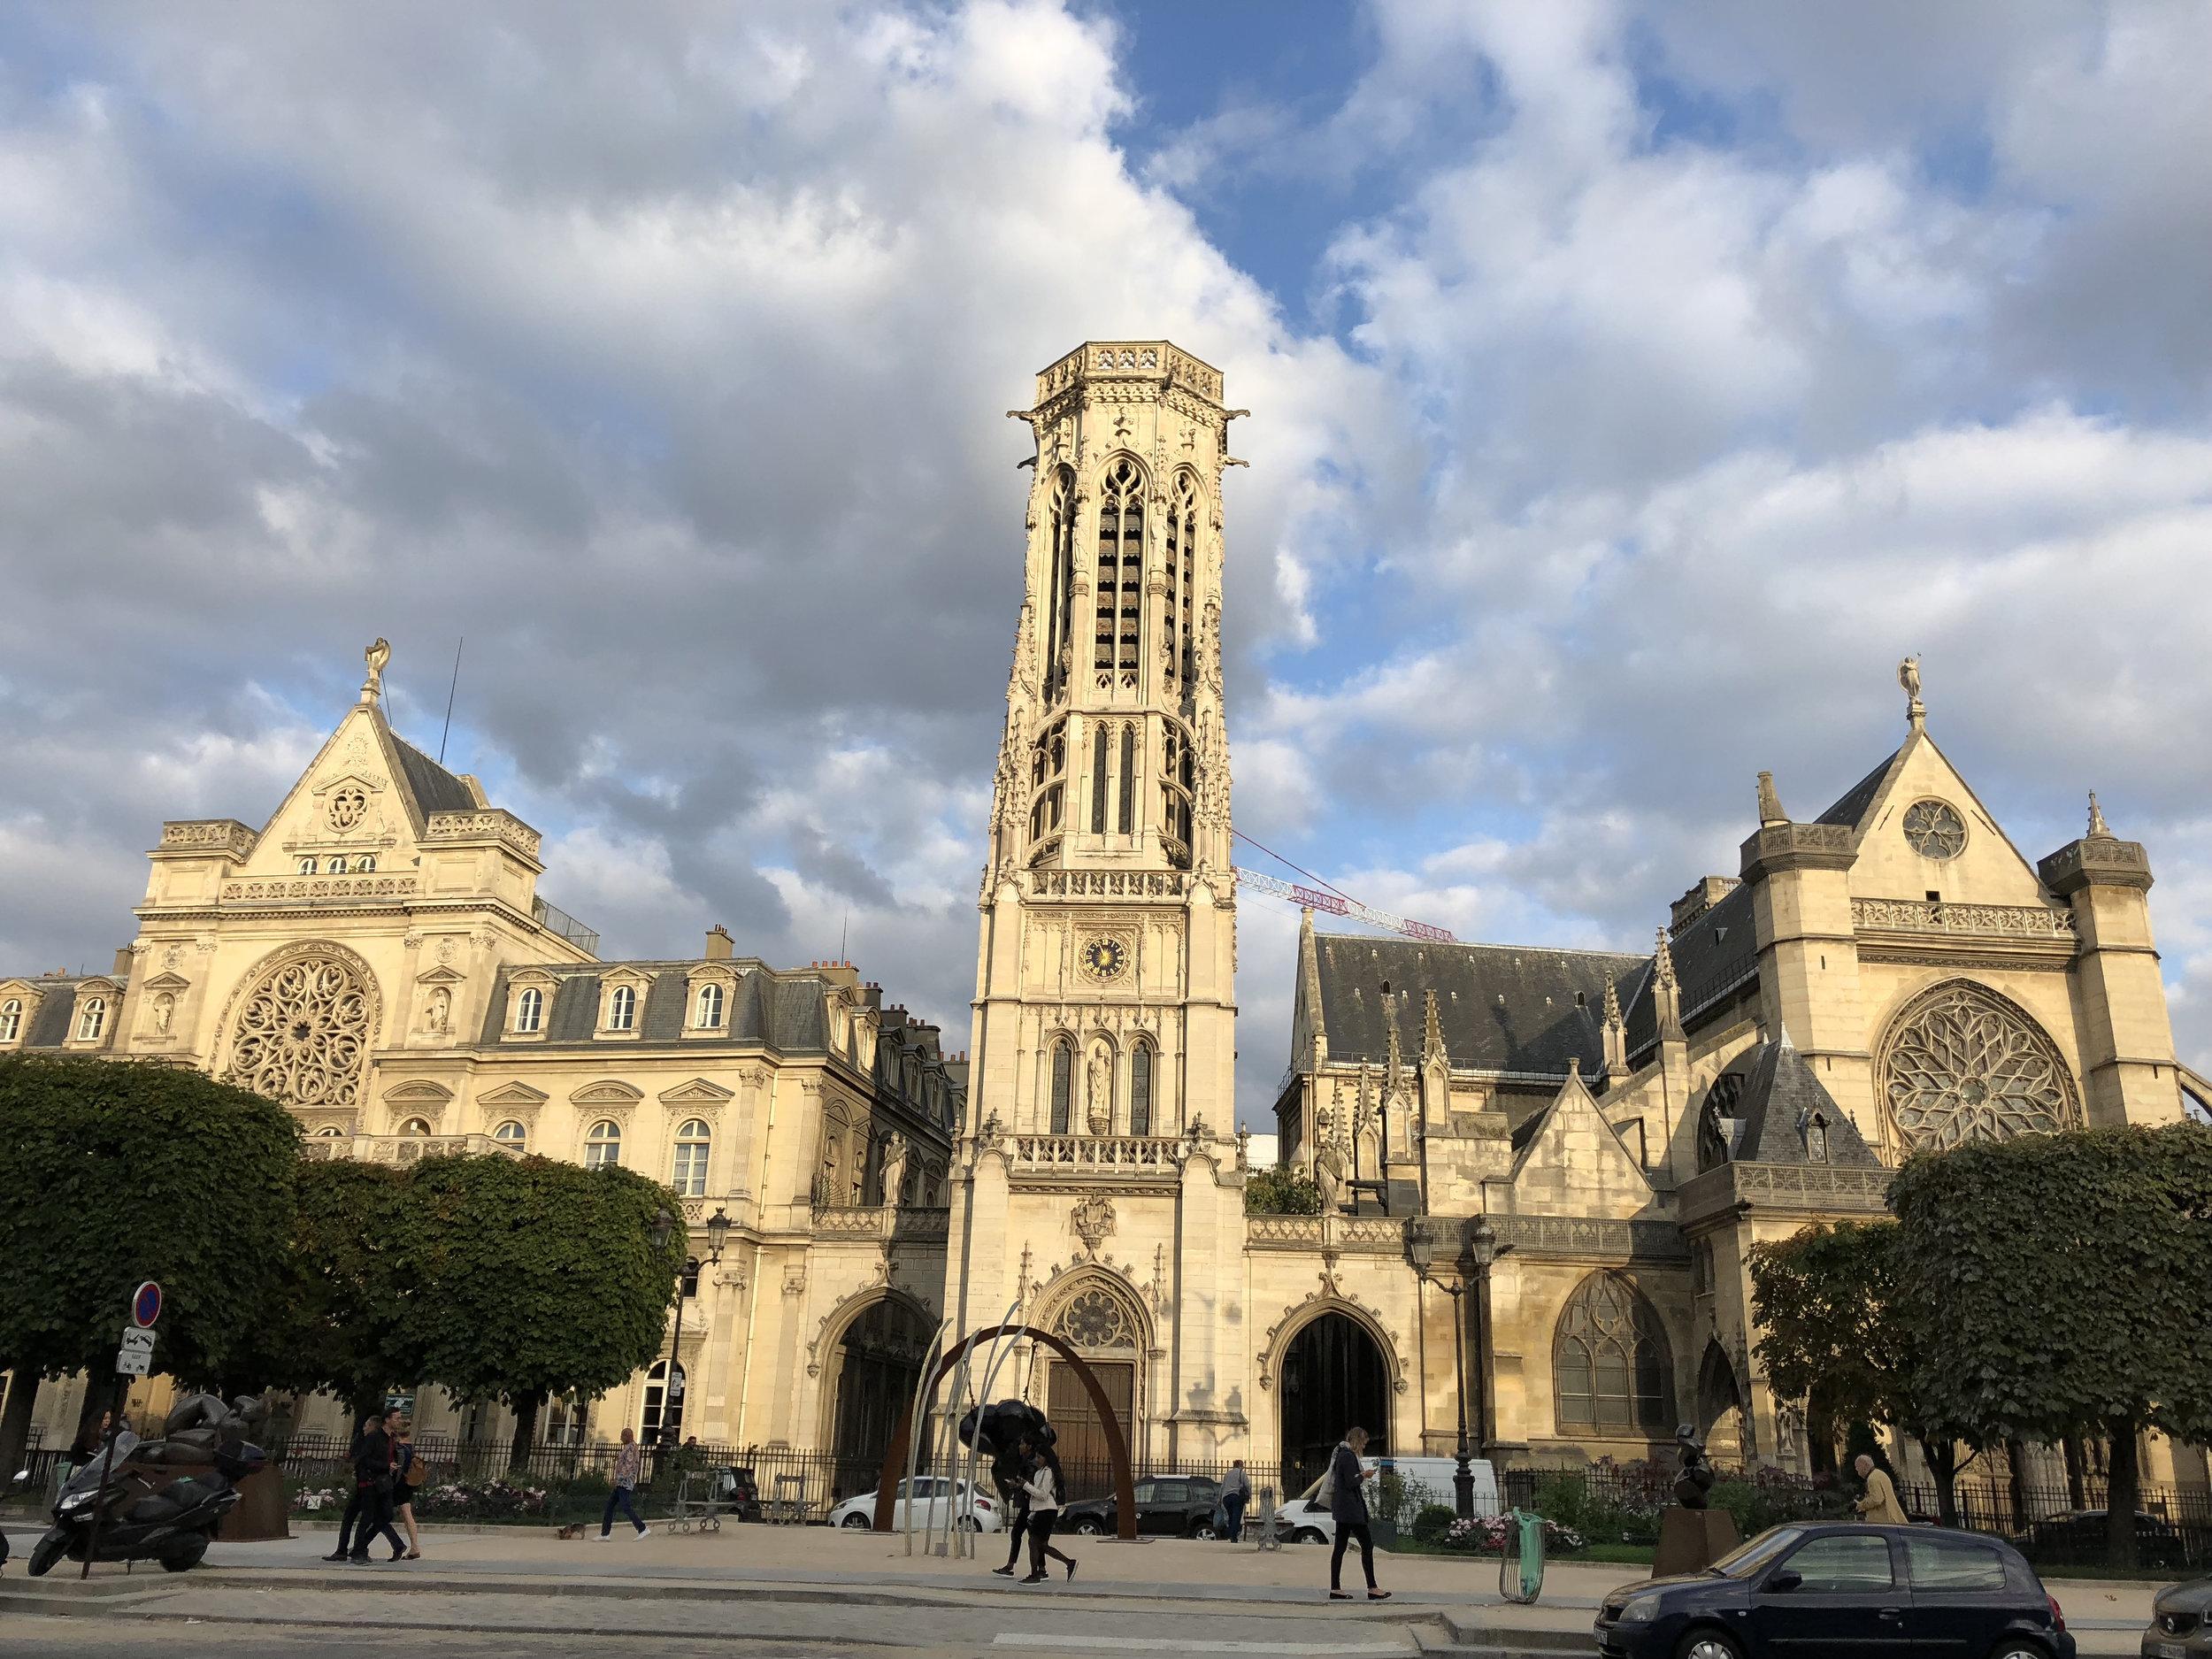 teri_Paris_laura'sbd_monet_giverny_l'orangerie_spiritedtable_photo22.jpg